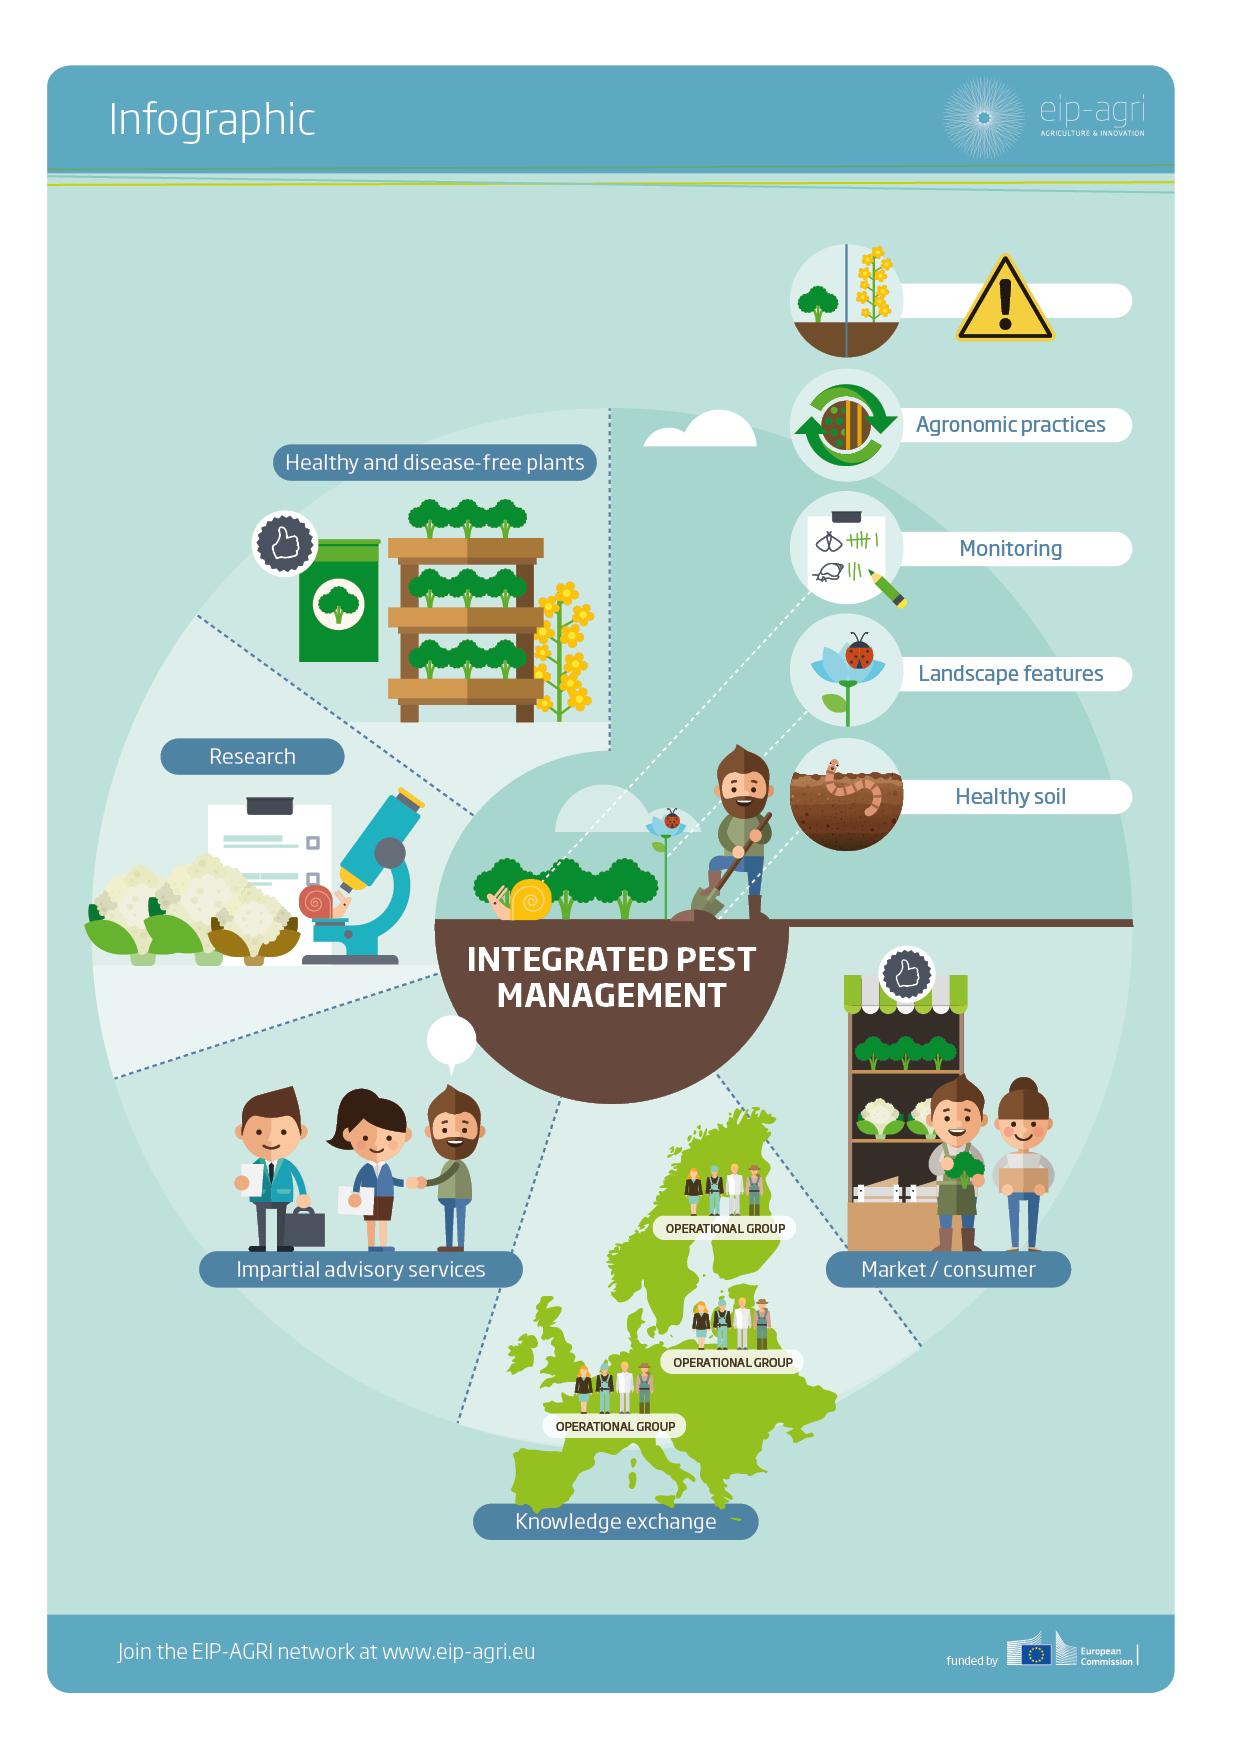 eip-agri_infographic_ipm_brassica_2017_e